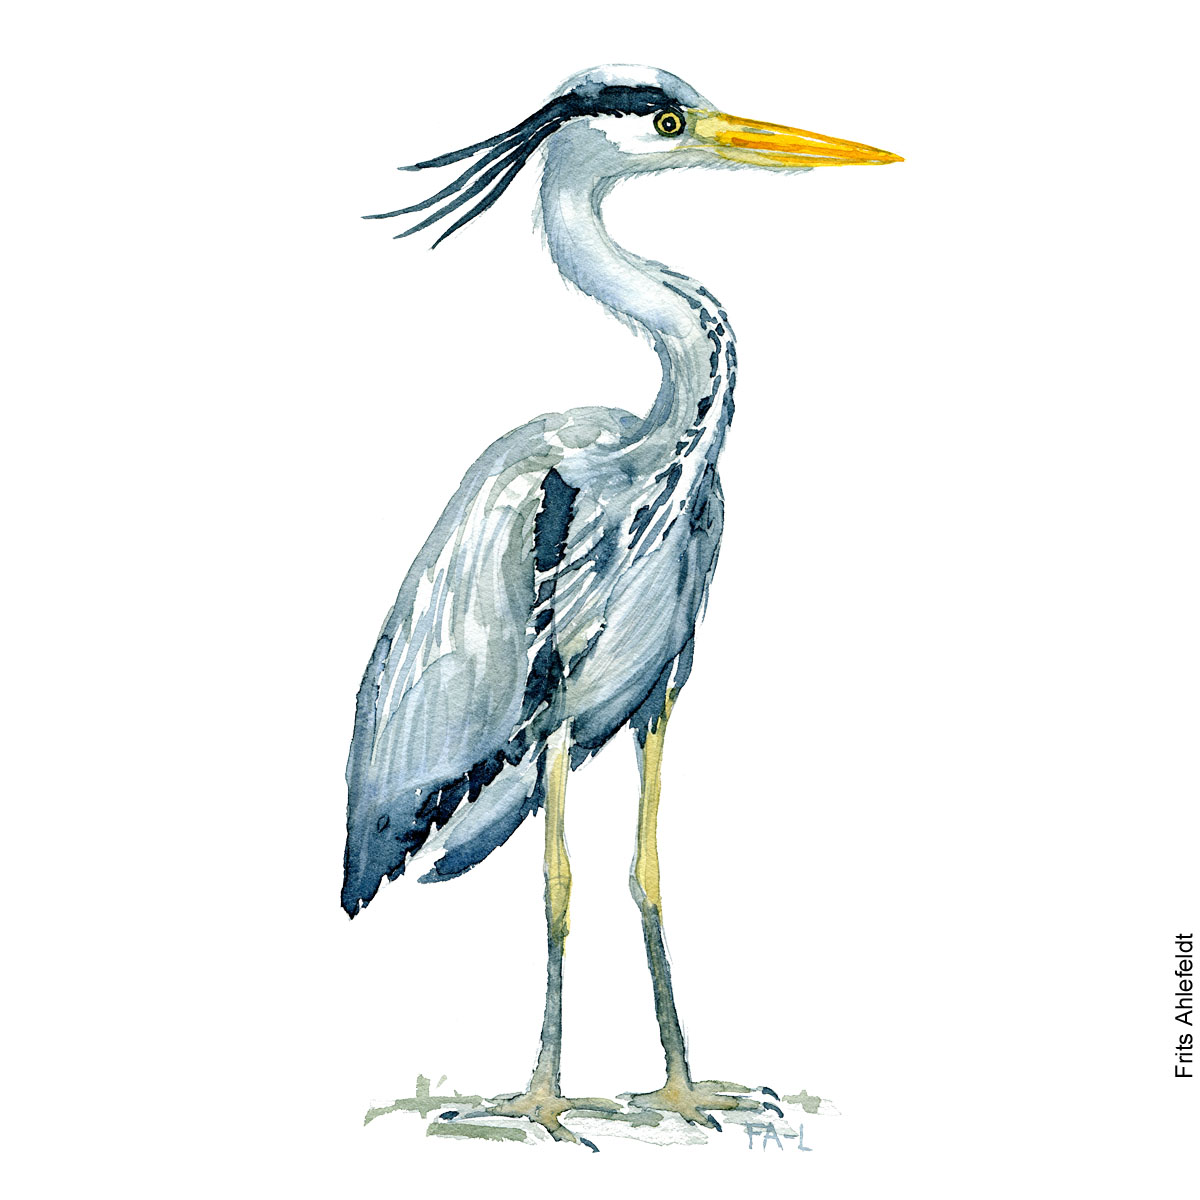 Grey heron Bird watercolor illustration handmade by Frits Ahlefeldt